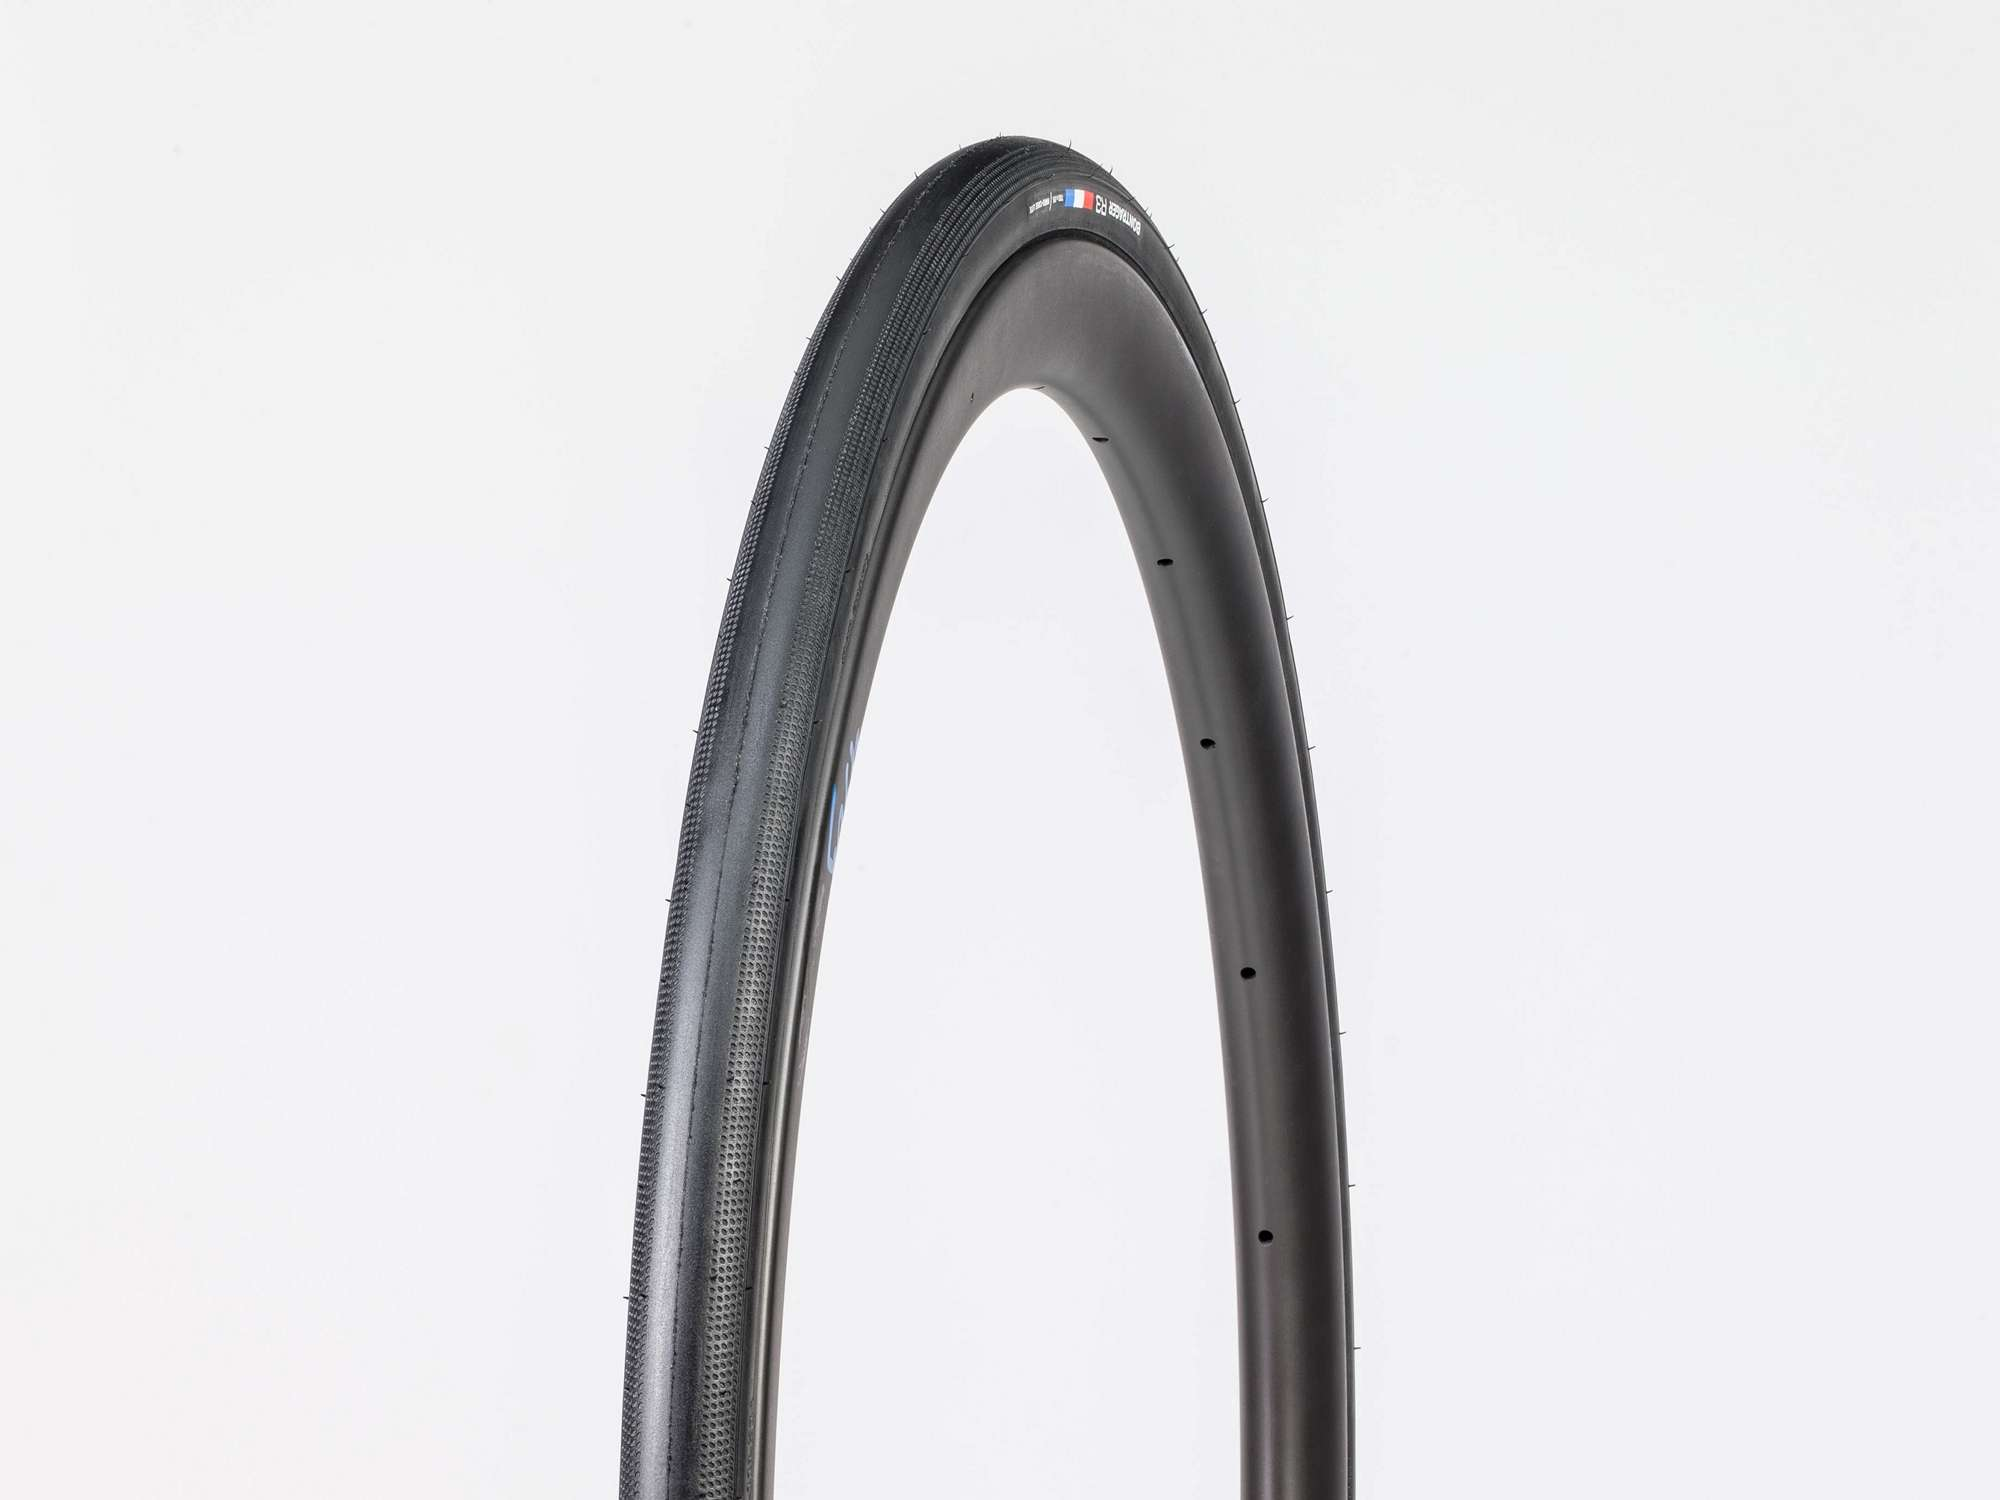 Tire Bontrager R3 Hard-Case Lite 700x25c